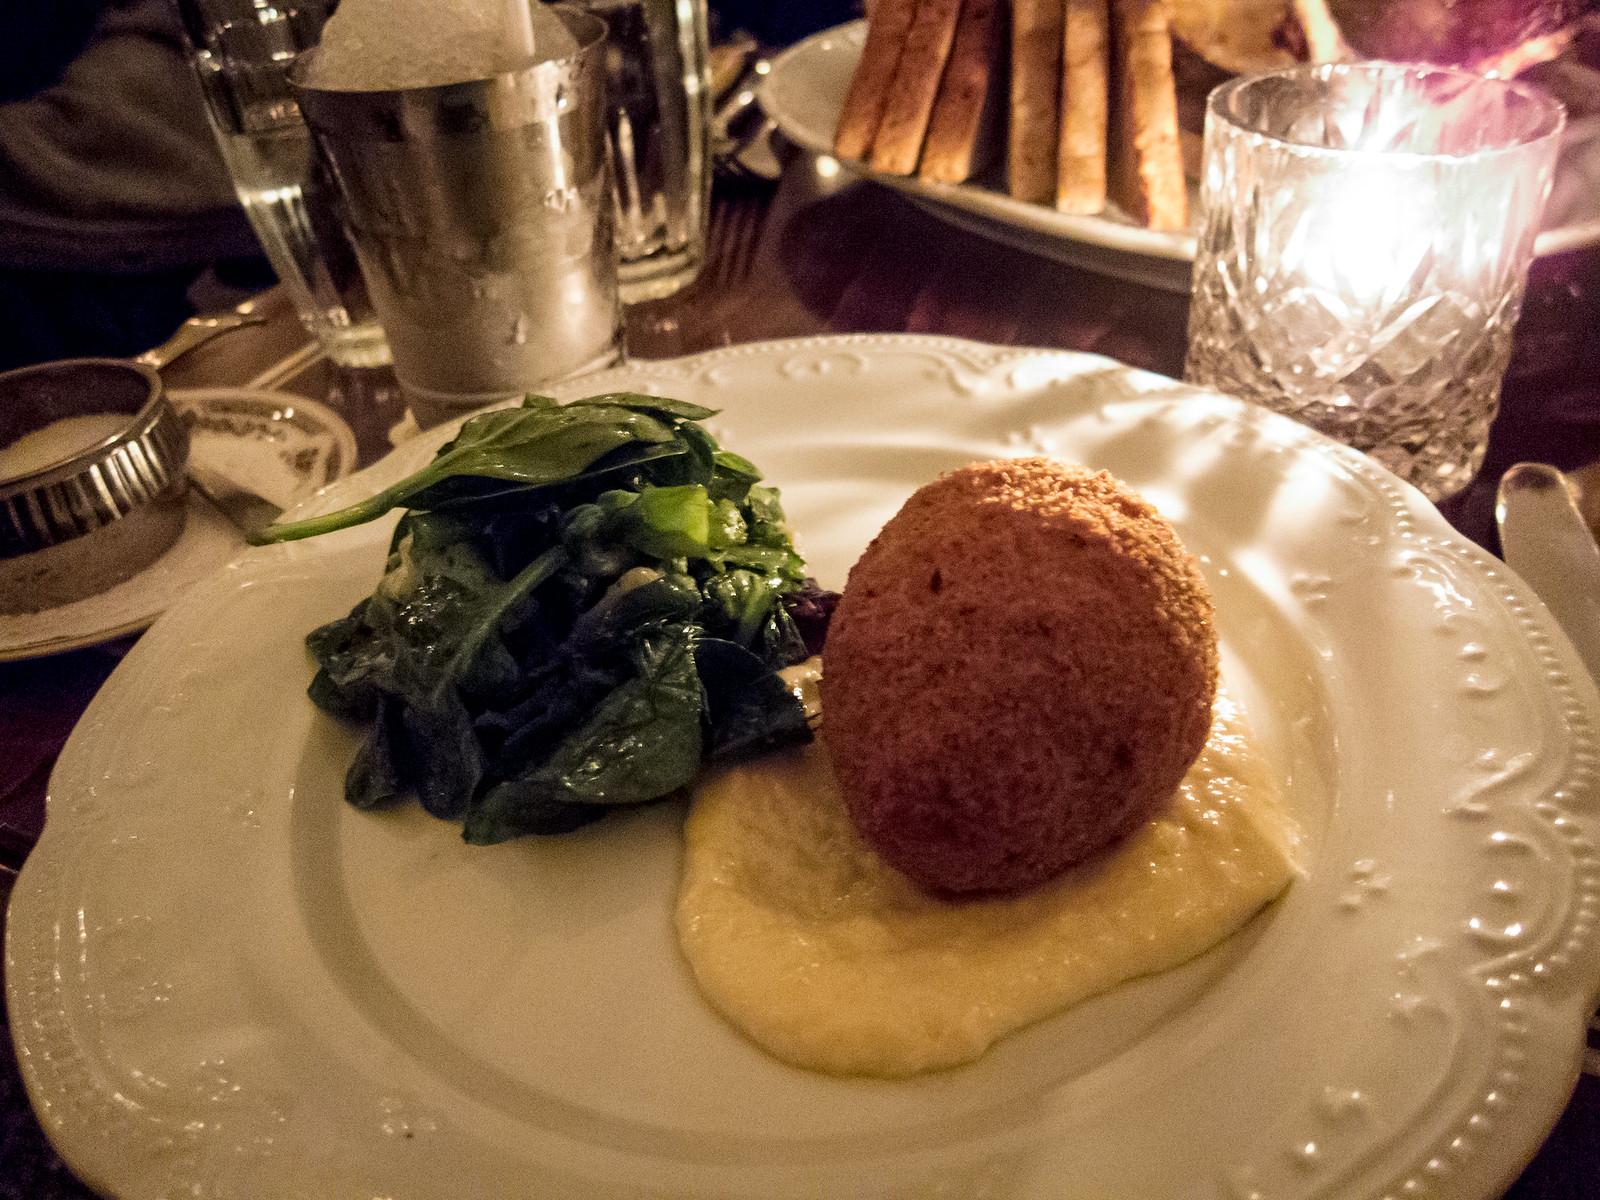 xiaoeats toronto food blog montreal taverne square. Black Bedroom Furniture Sets. Home Design Ideas